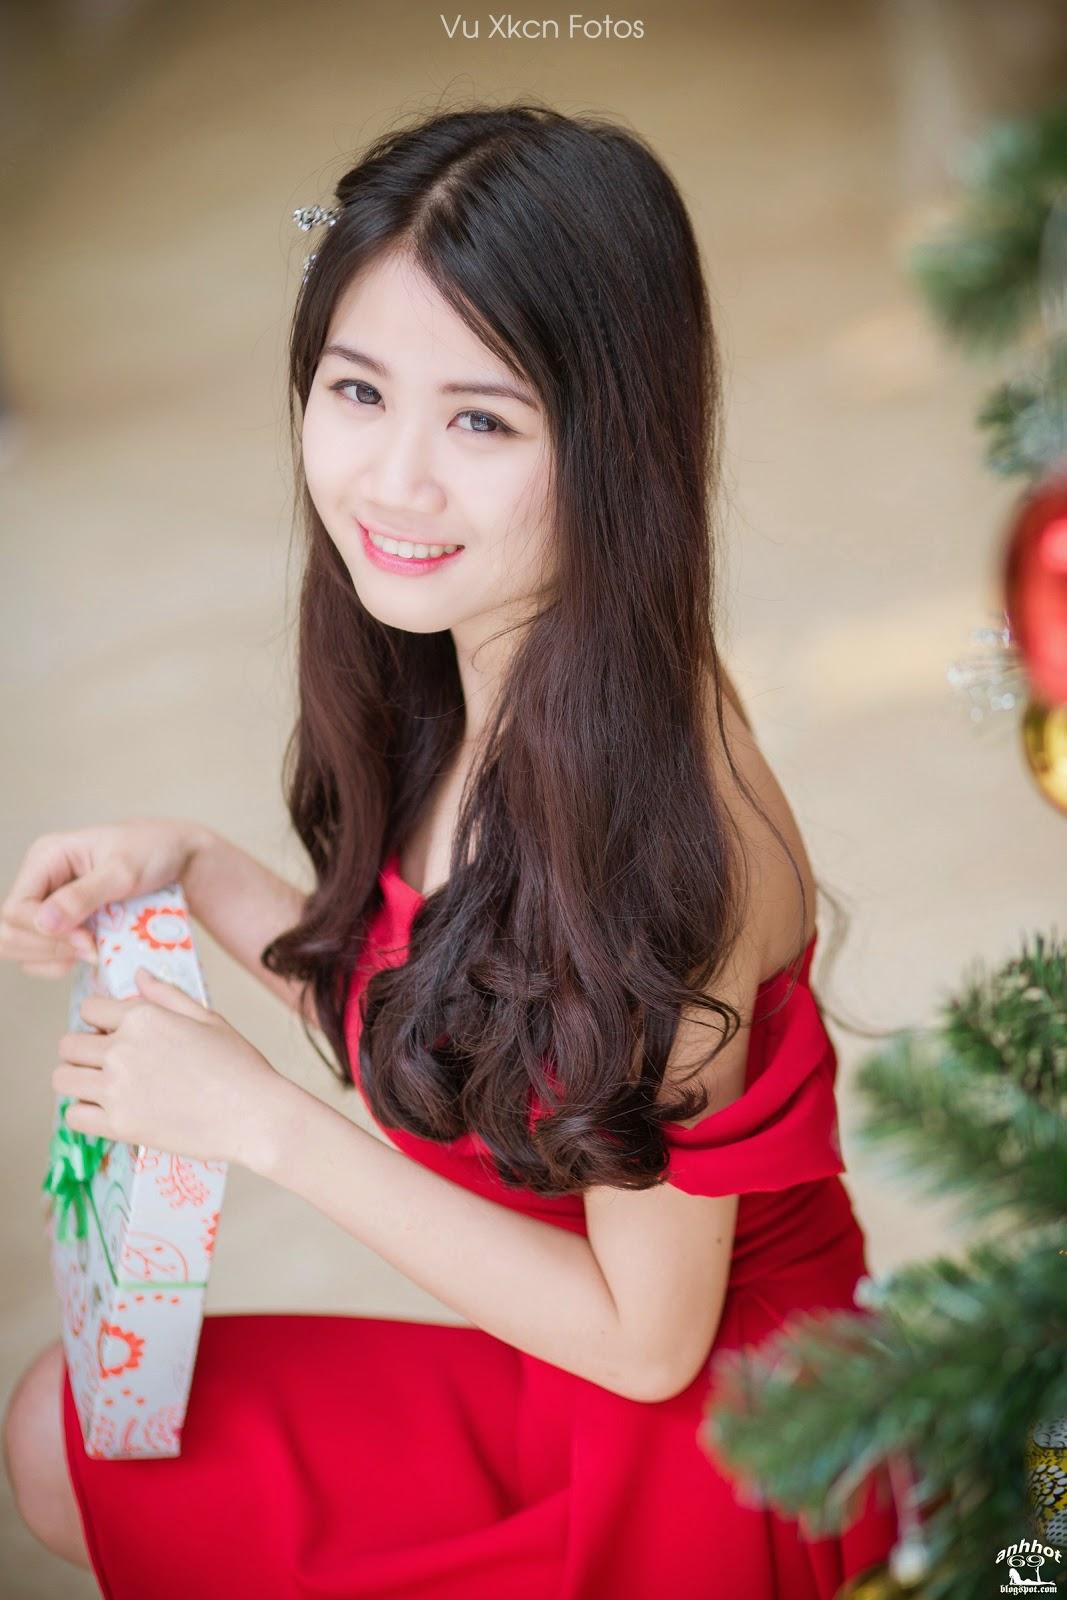 merry-christmas_1412251540_07